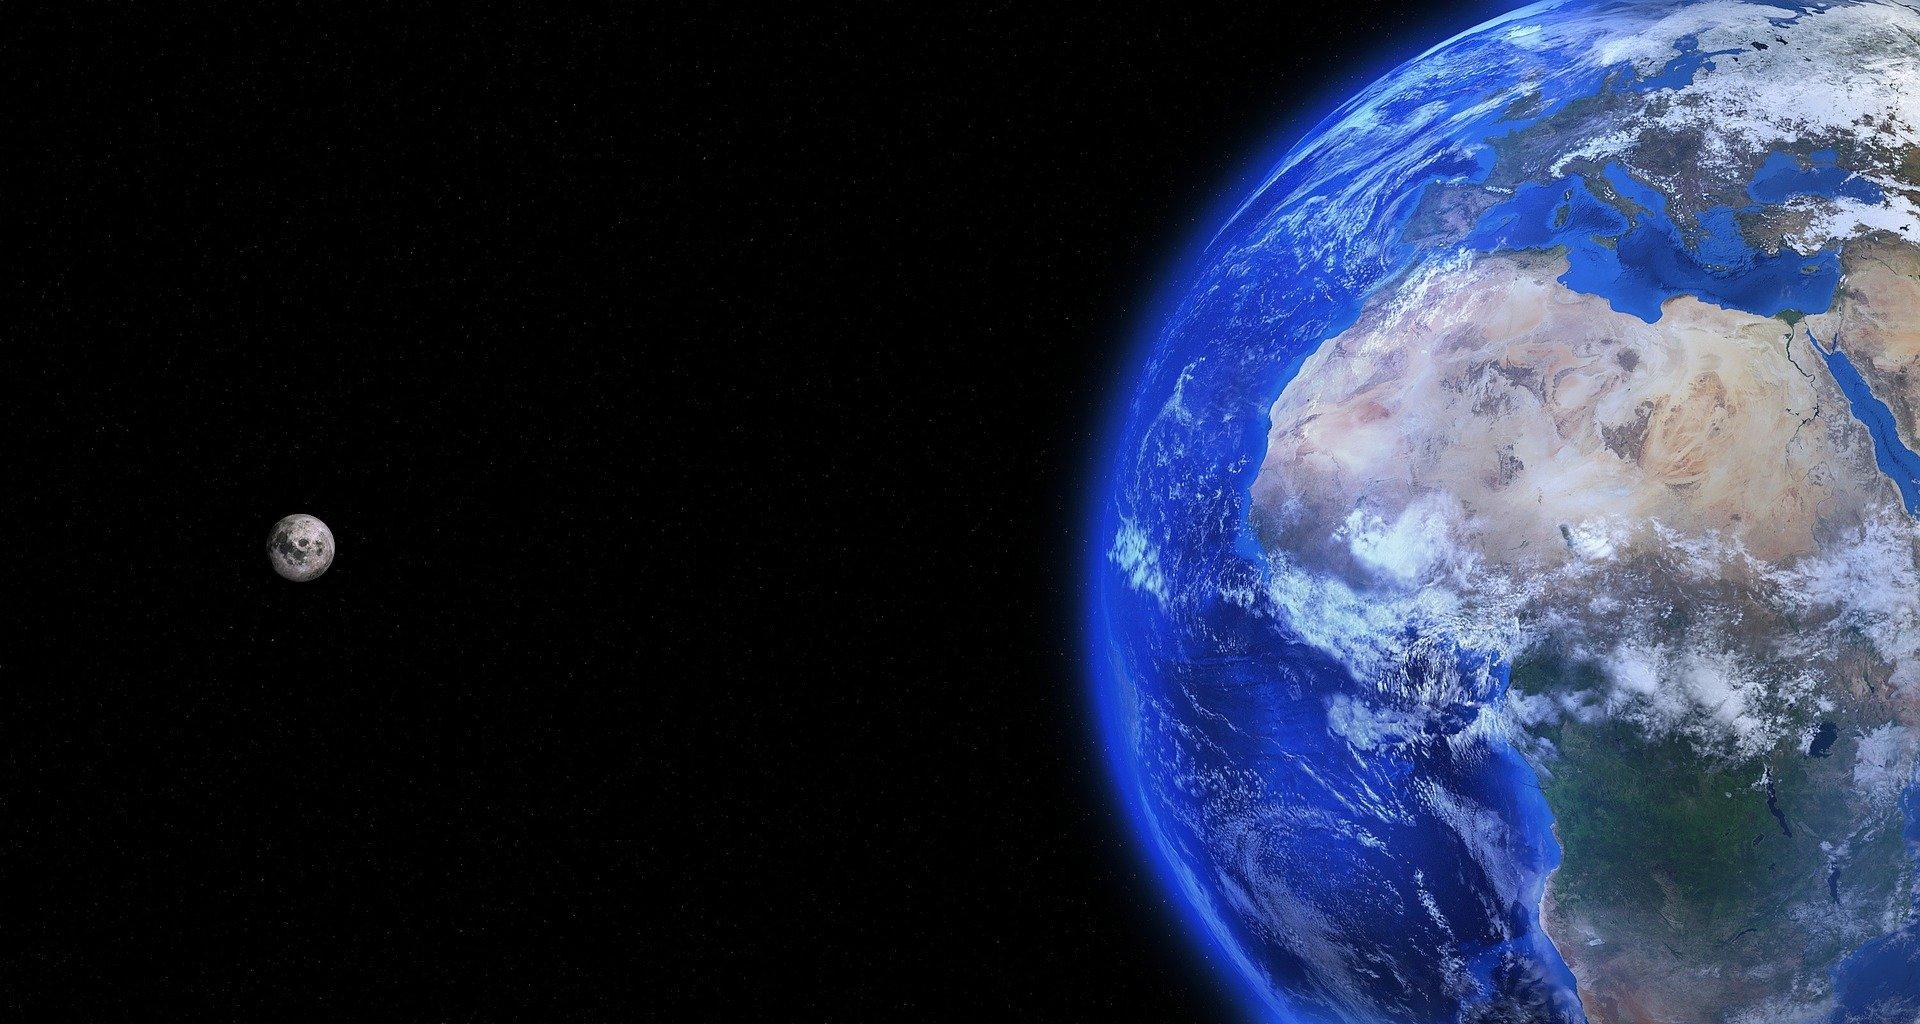 LIVING PLANET WWF REPORT 2020